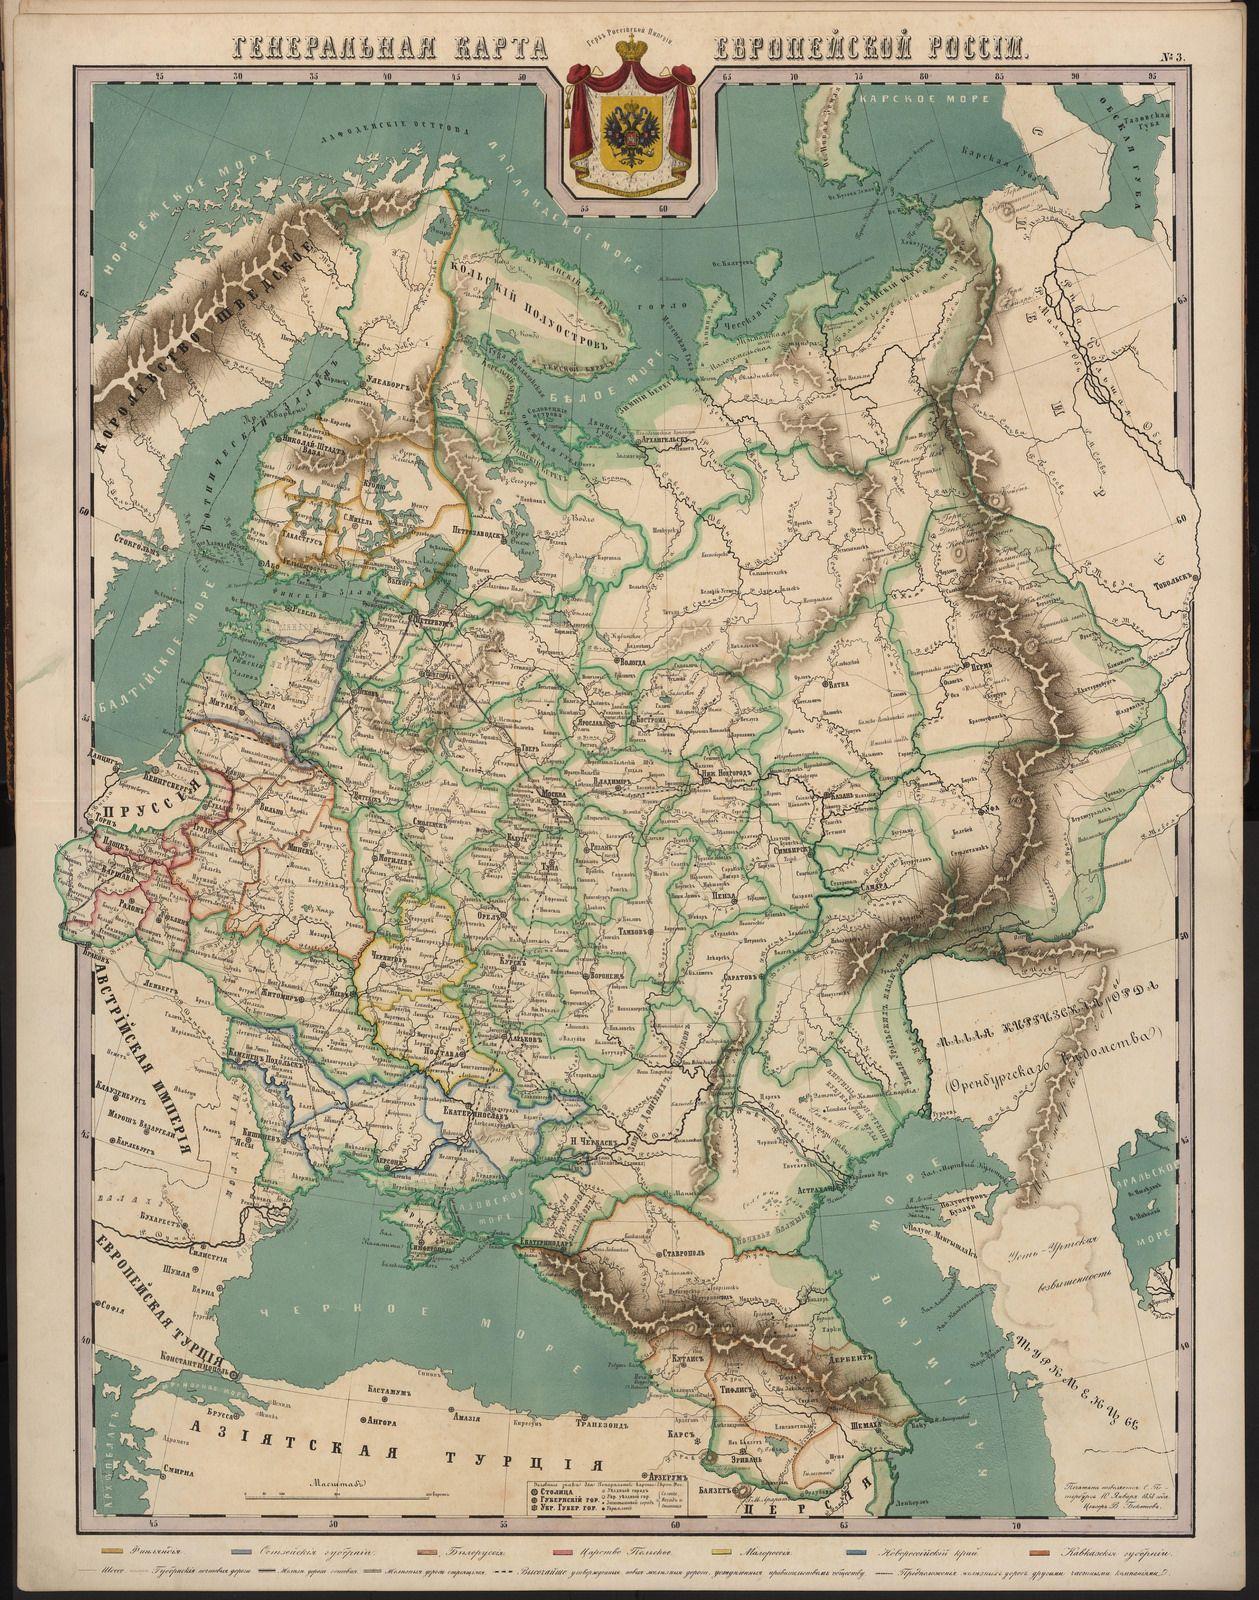 Podrobnyj Atlas Rossijskoj Imperii 1860 Starye Karty Karta